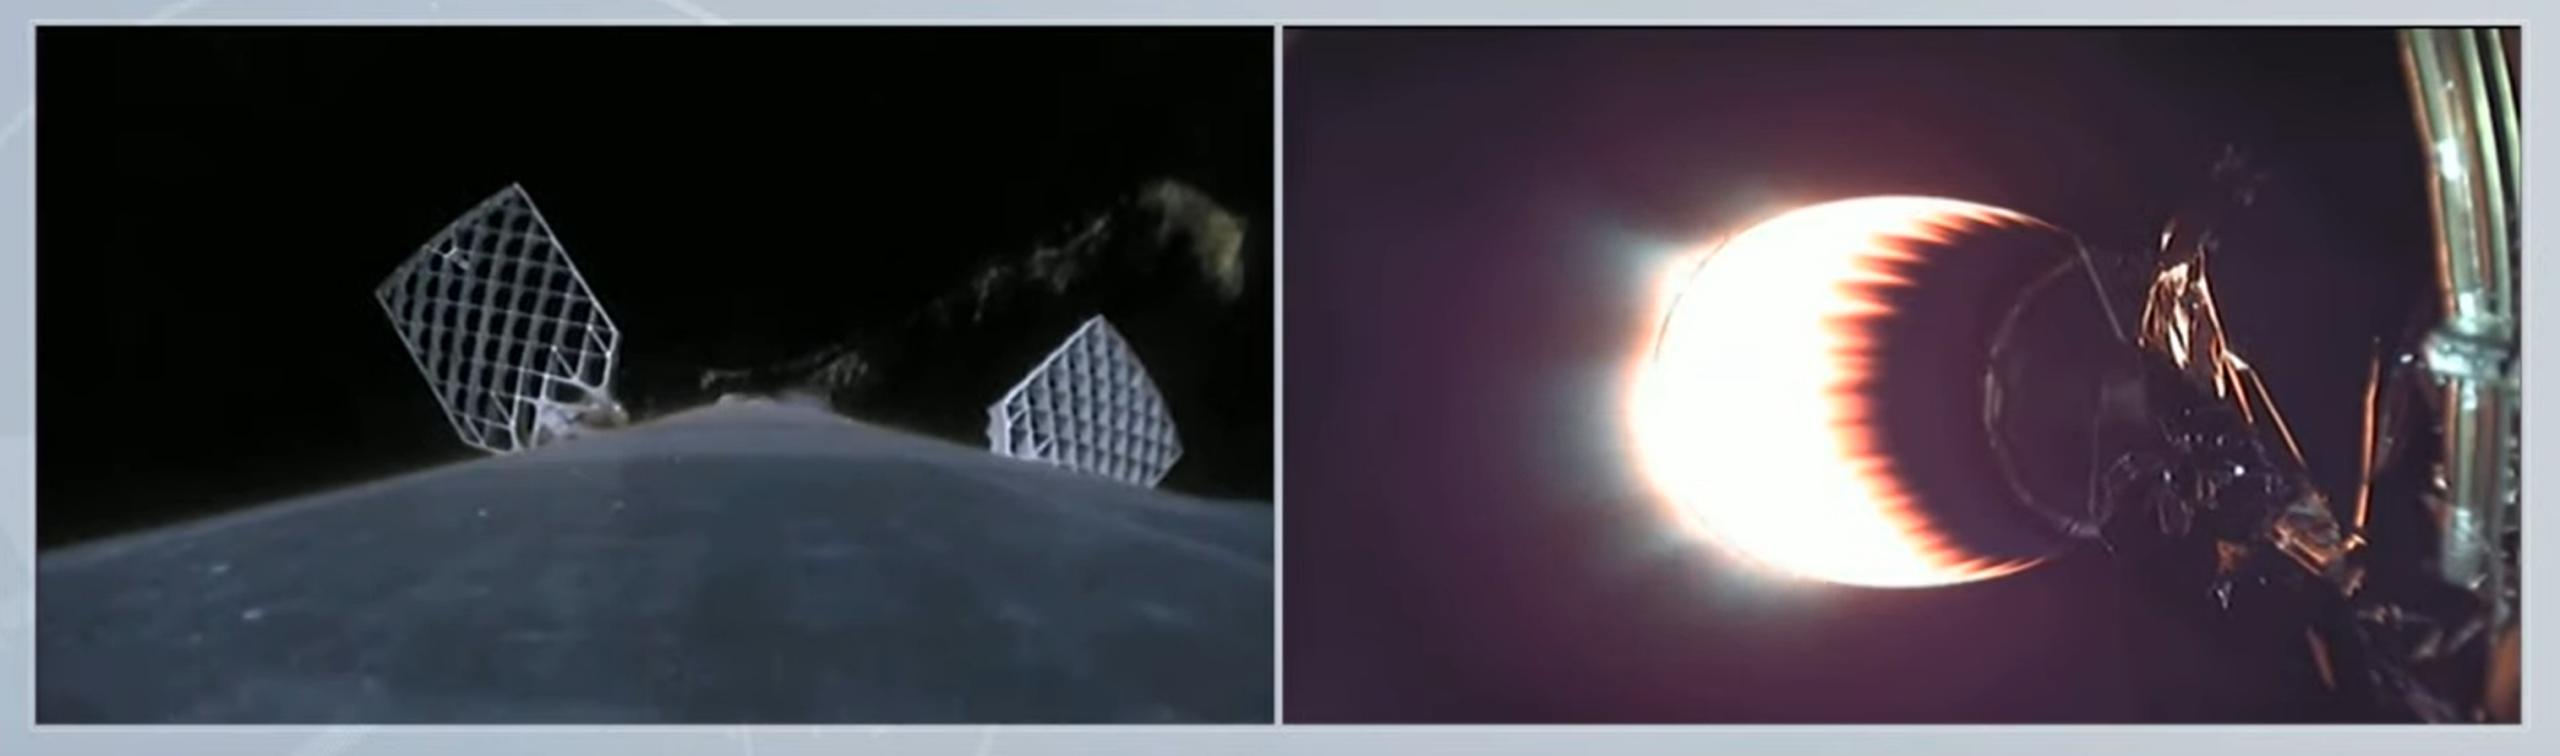 Crew-2 Crew Dragon C206 Falcon 9 B1061 042321 webcast (SpaceX) launch 5 (c)